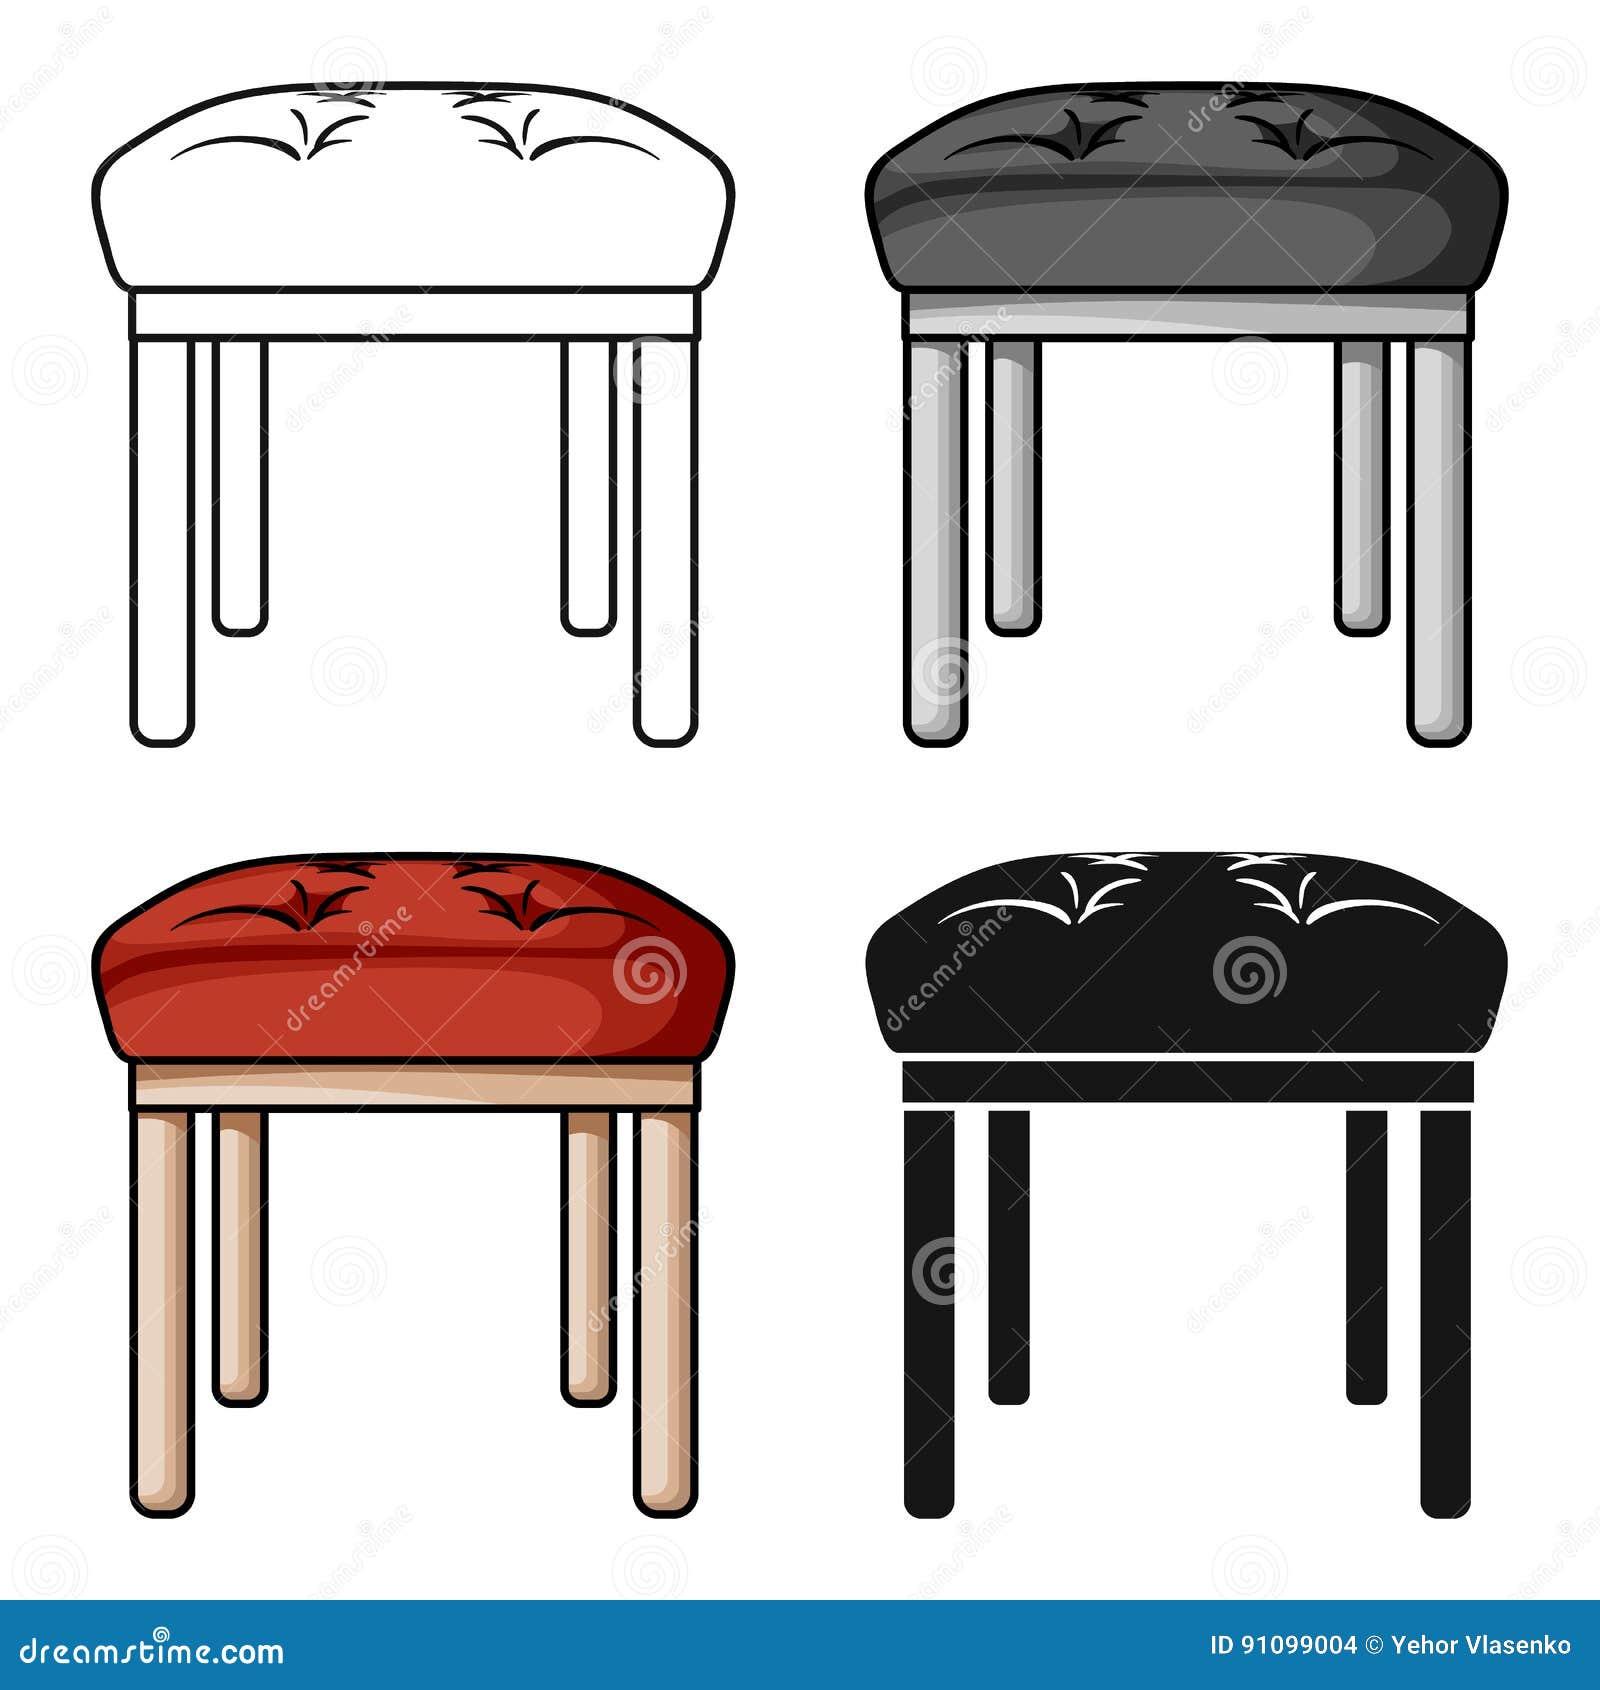 Stool Icon In Cartoon Style Isolated On White Background ... on chairs icon, bar shelf icon, furniture icon, fireplace icon, books icon, snowflake icon, bar soap icon, leather icon, table icon, console icon,